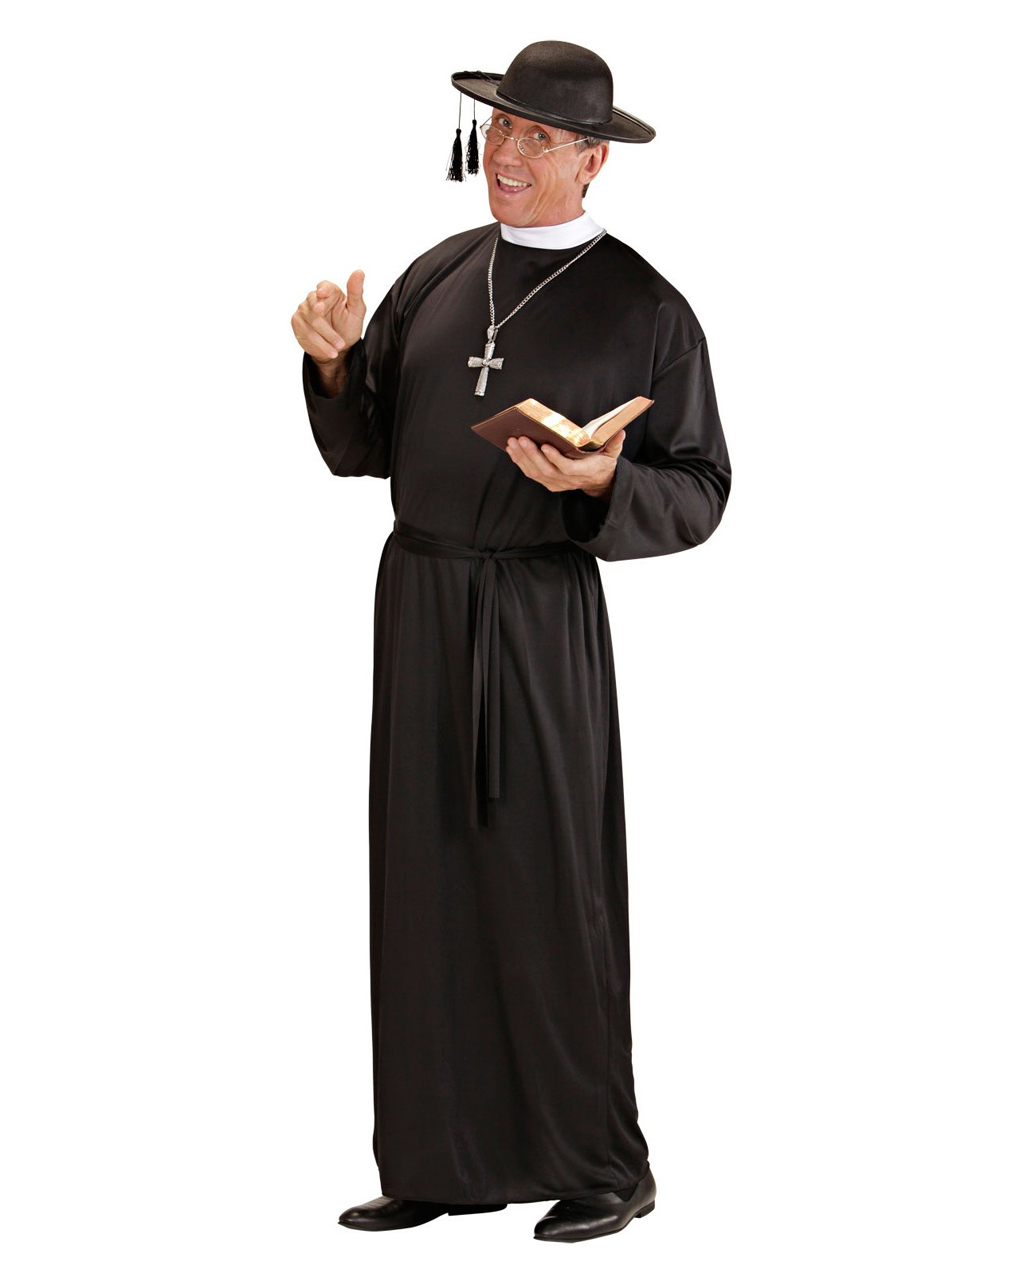 priestergewand kostüm